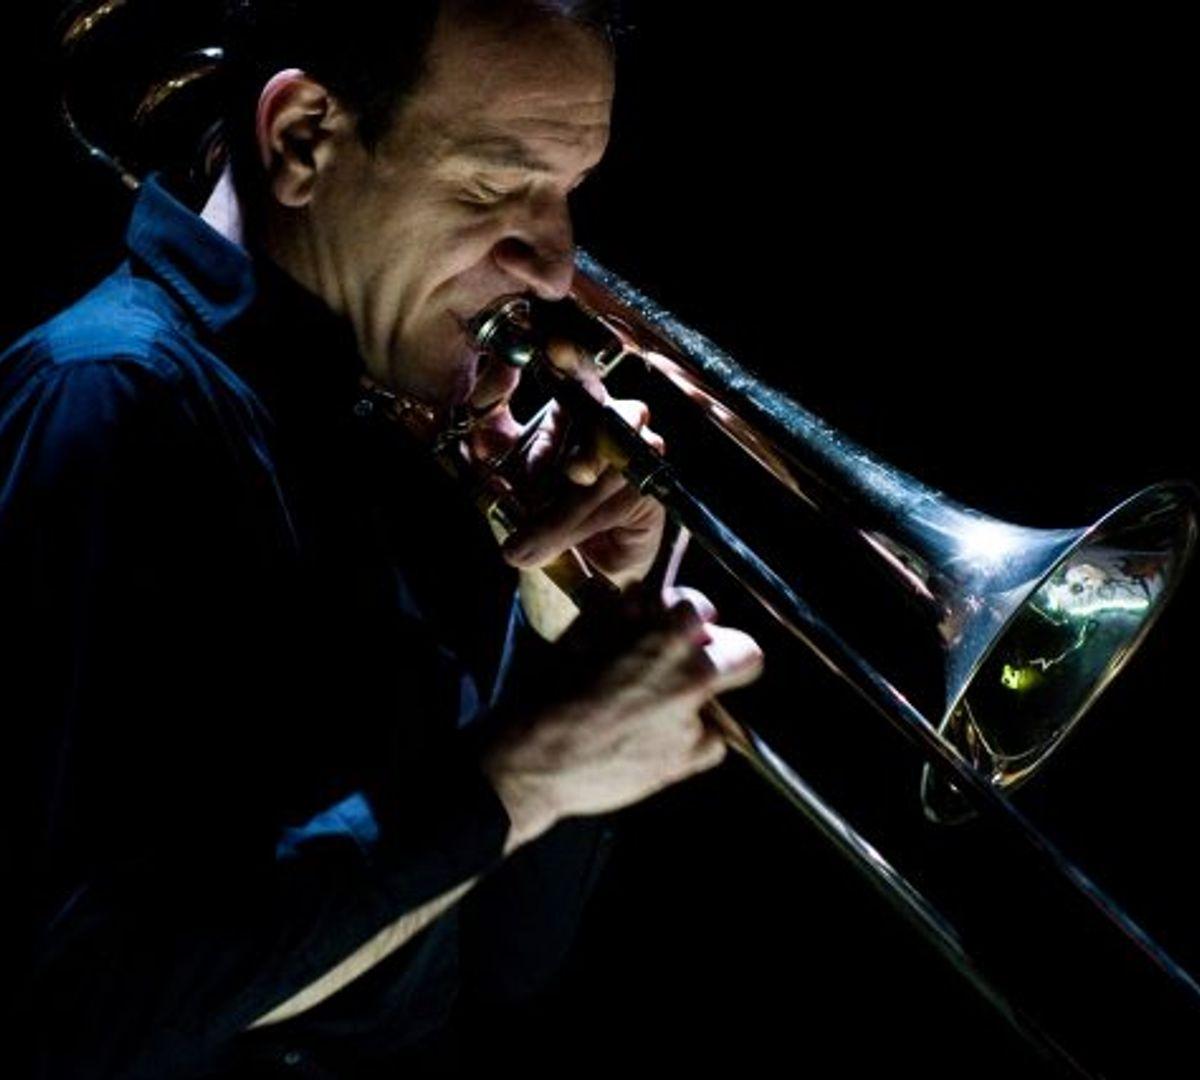 Joachim Concert 2 640x427.jpg